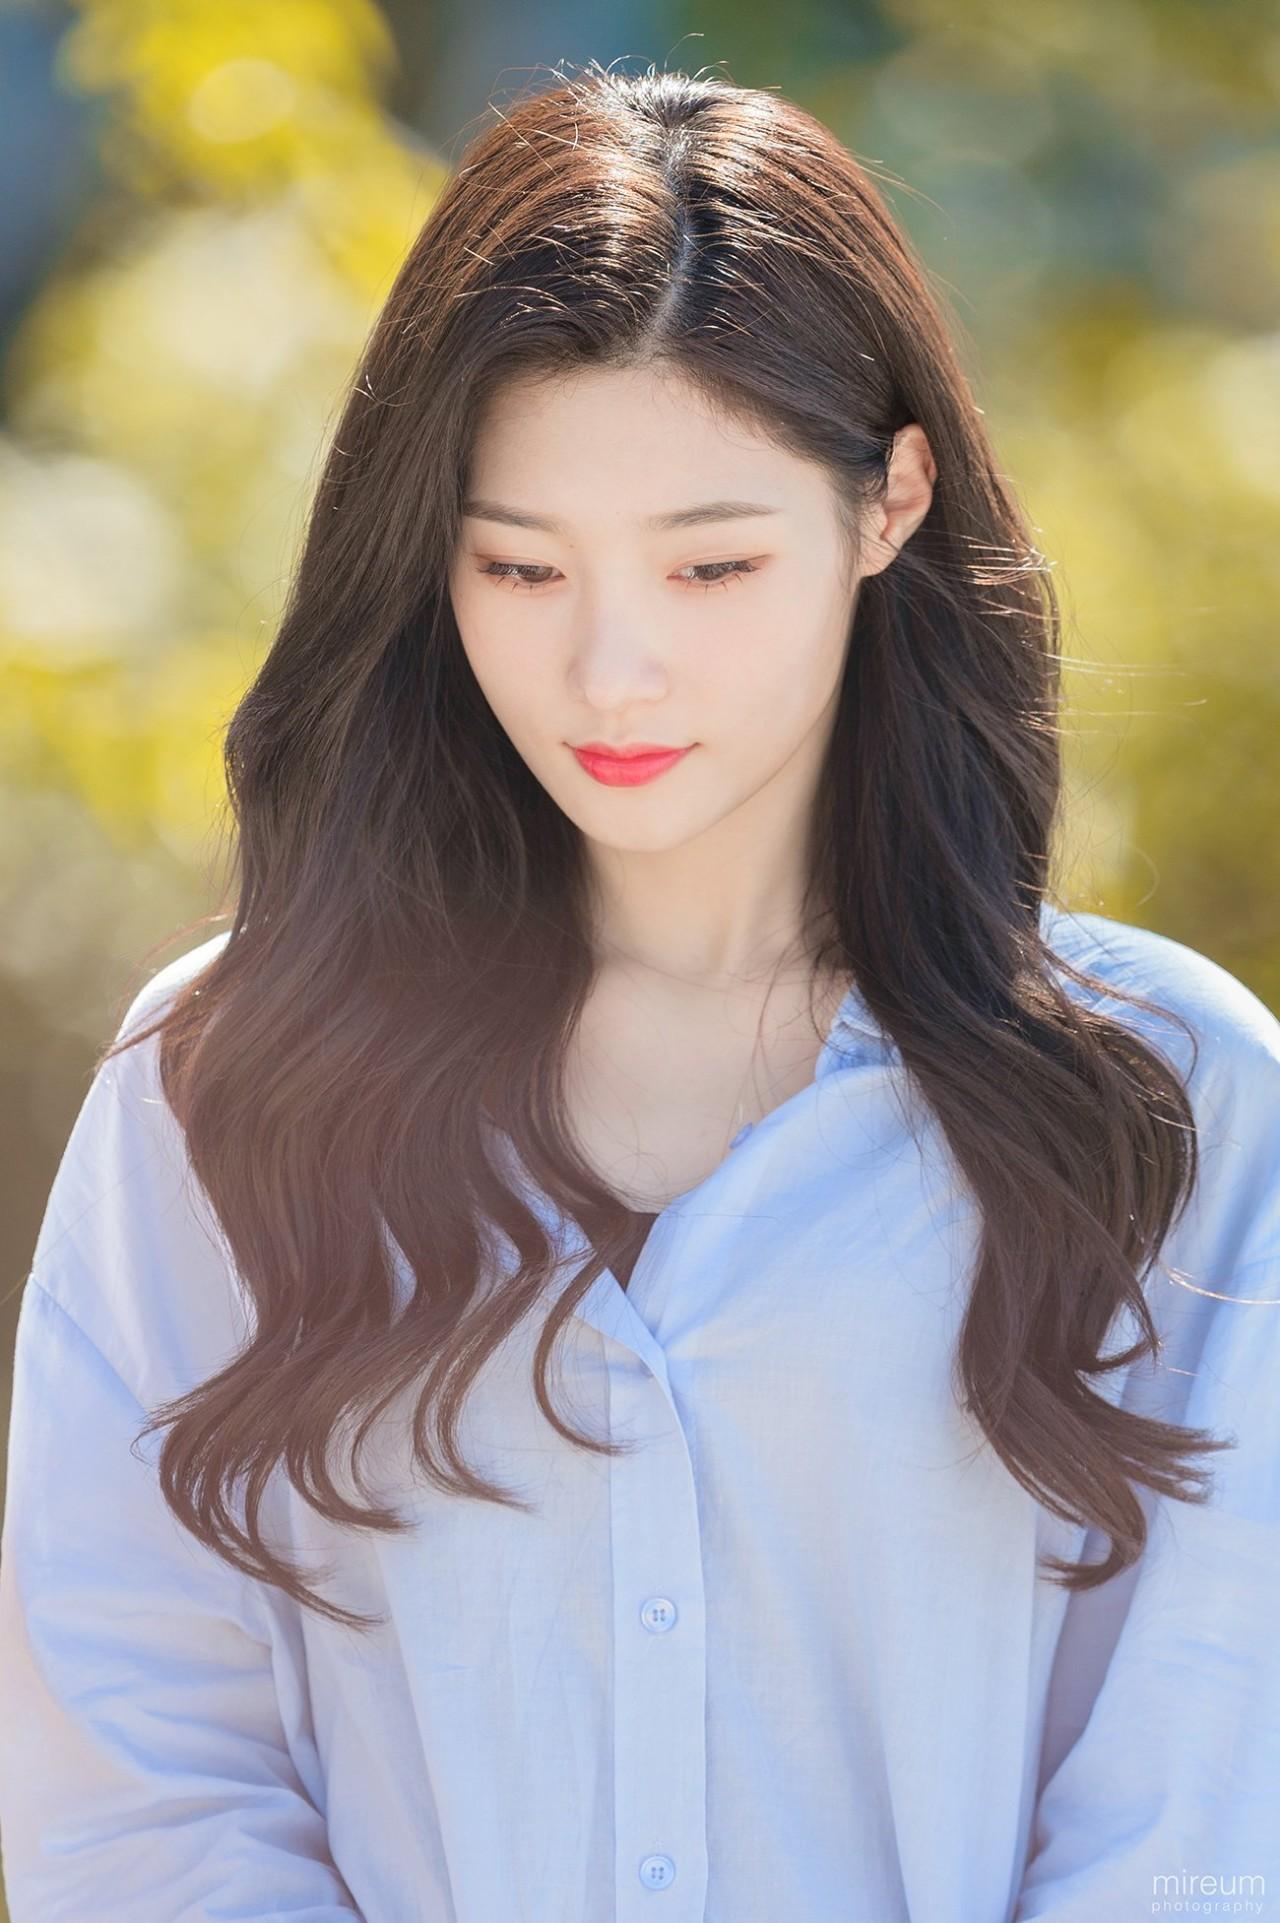 dia jung chaeyeon faint cold 1